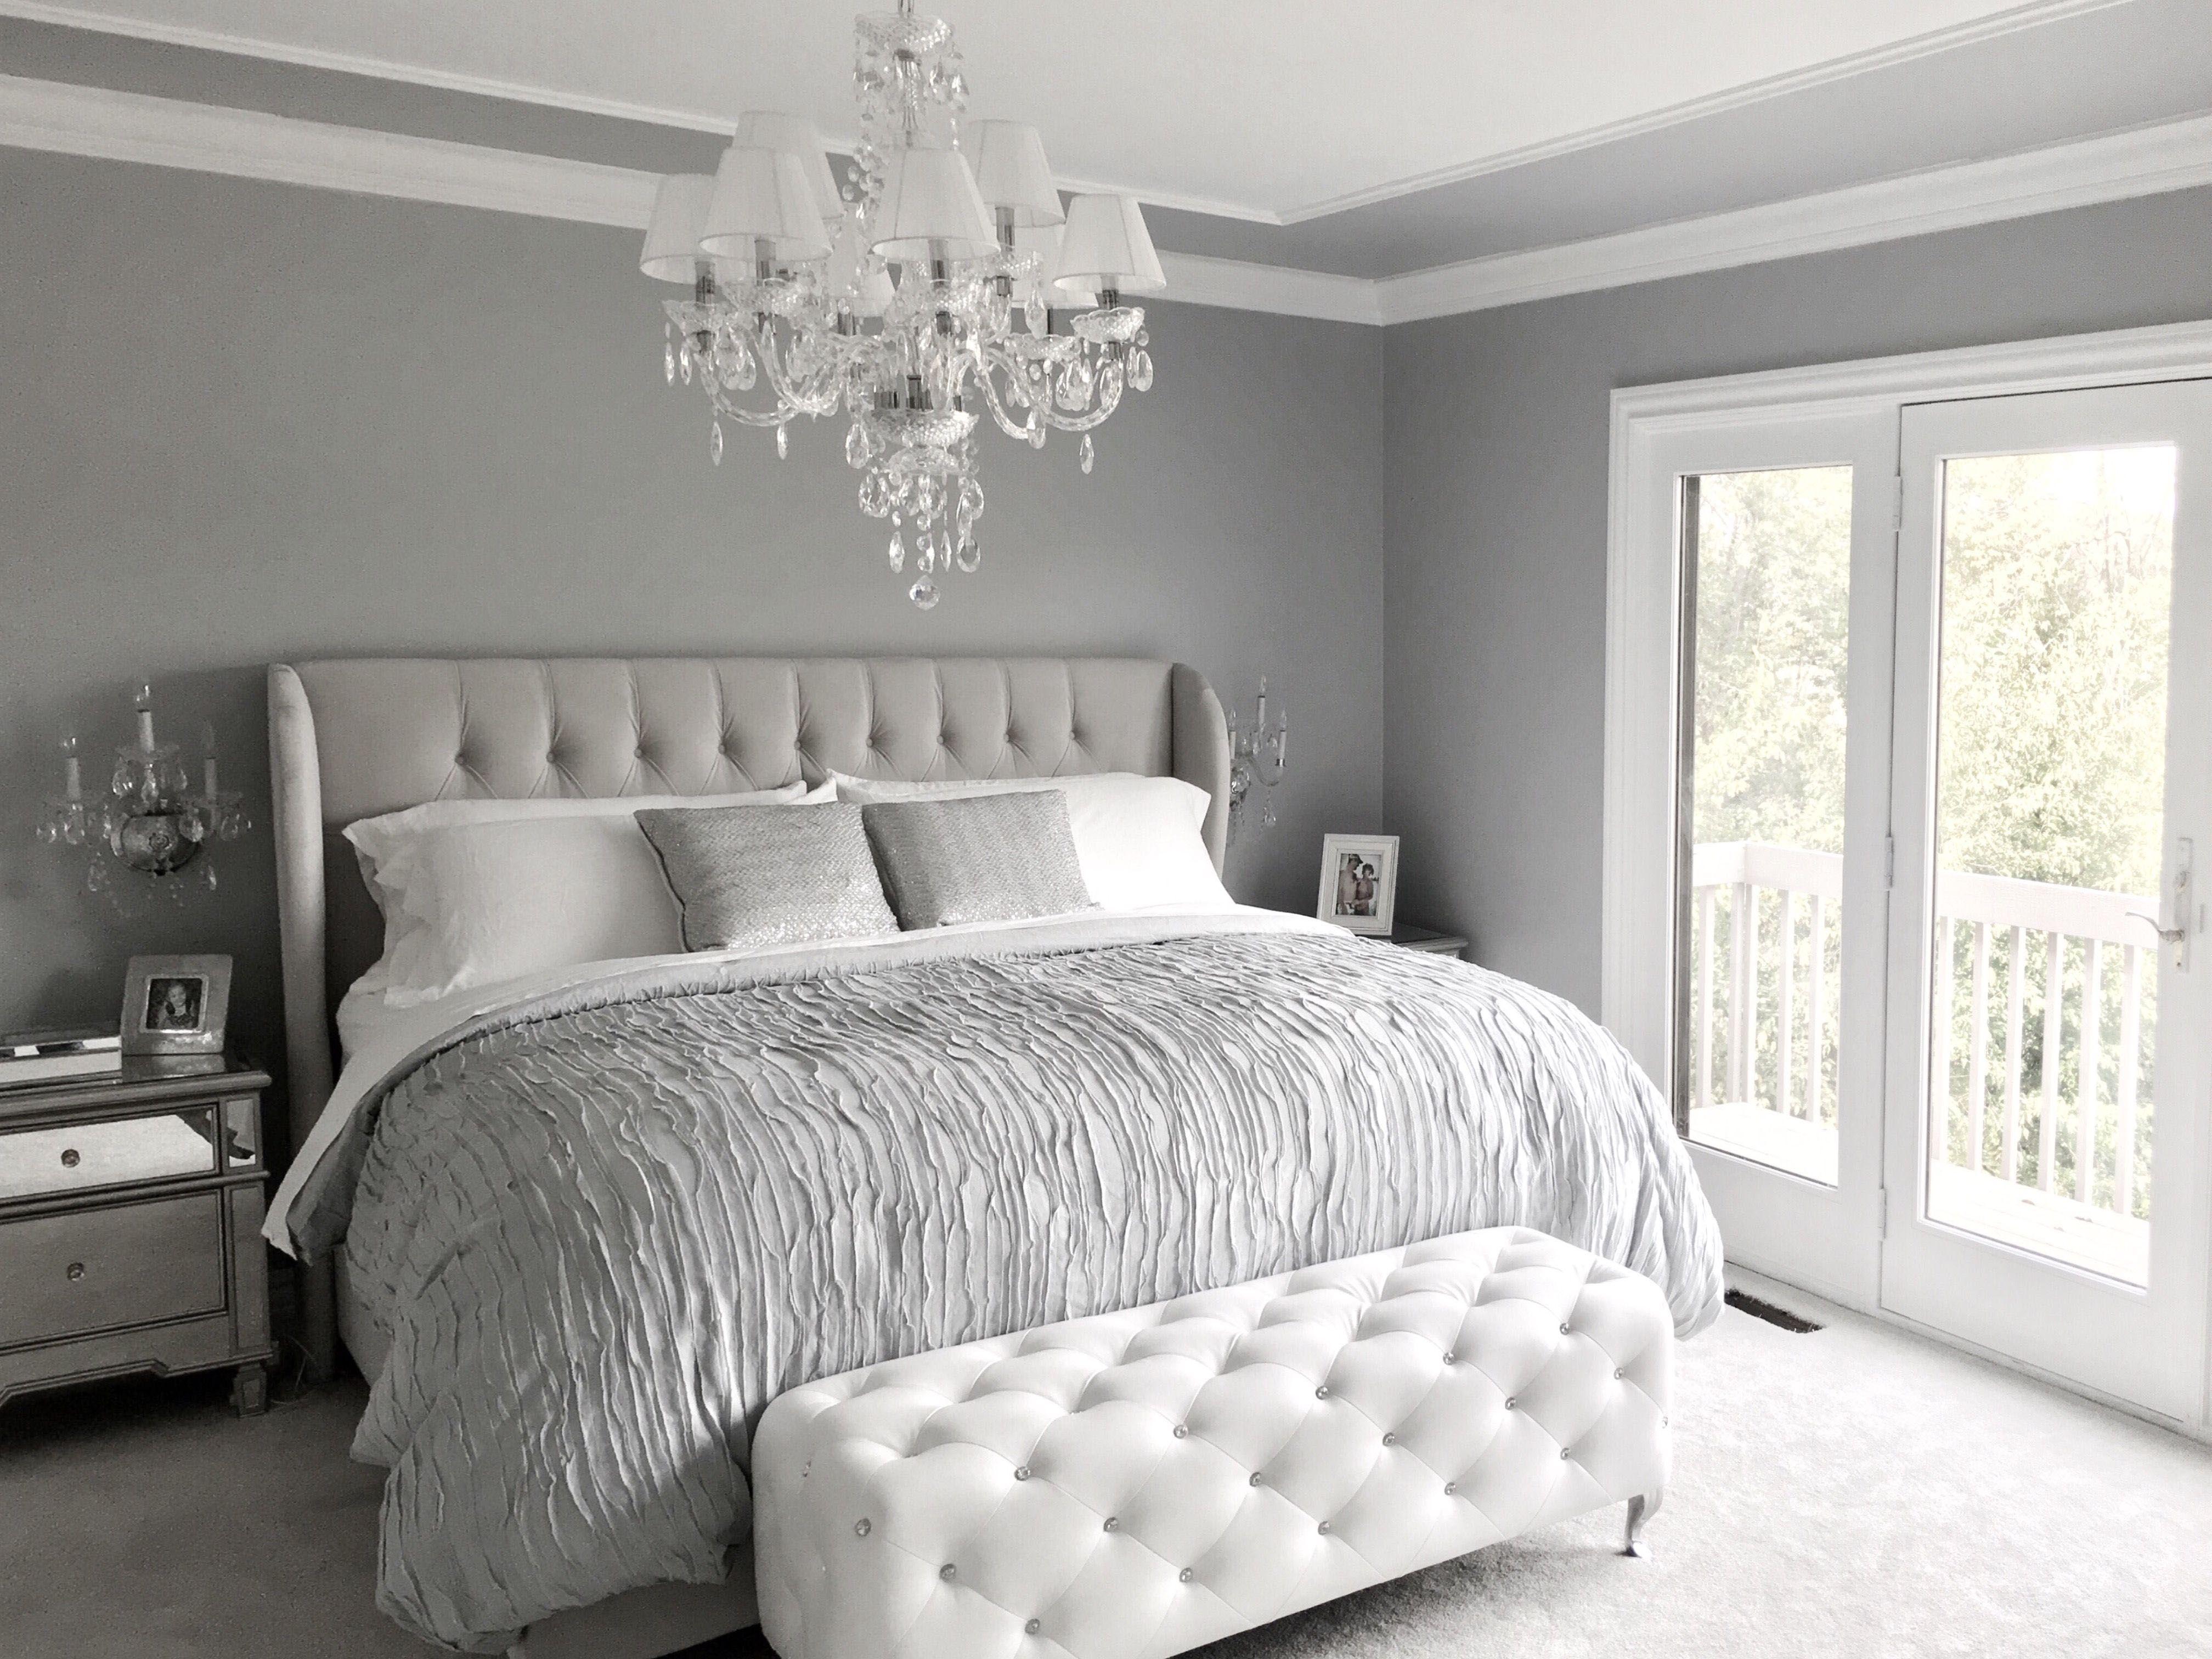 New Grey Mustard Bedroom Ideas Exclusive On Shopy Home Decor Grey Bedroom Decor Glamourous Bedroom Luxurious Bedrooms